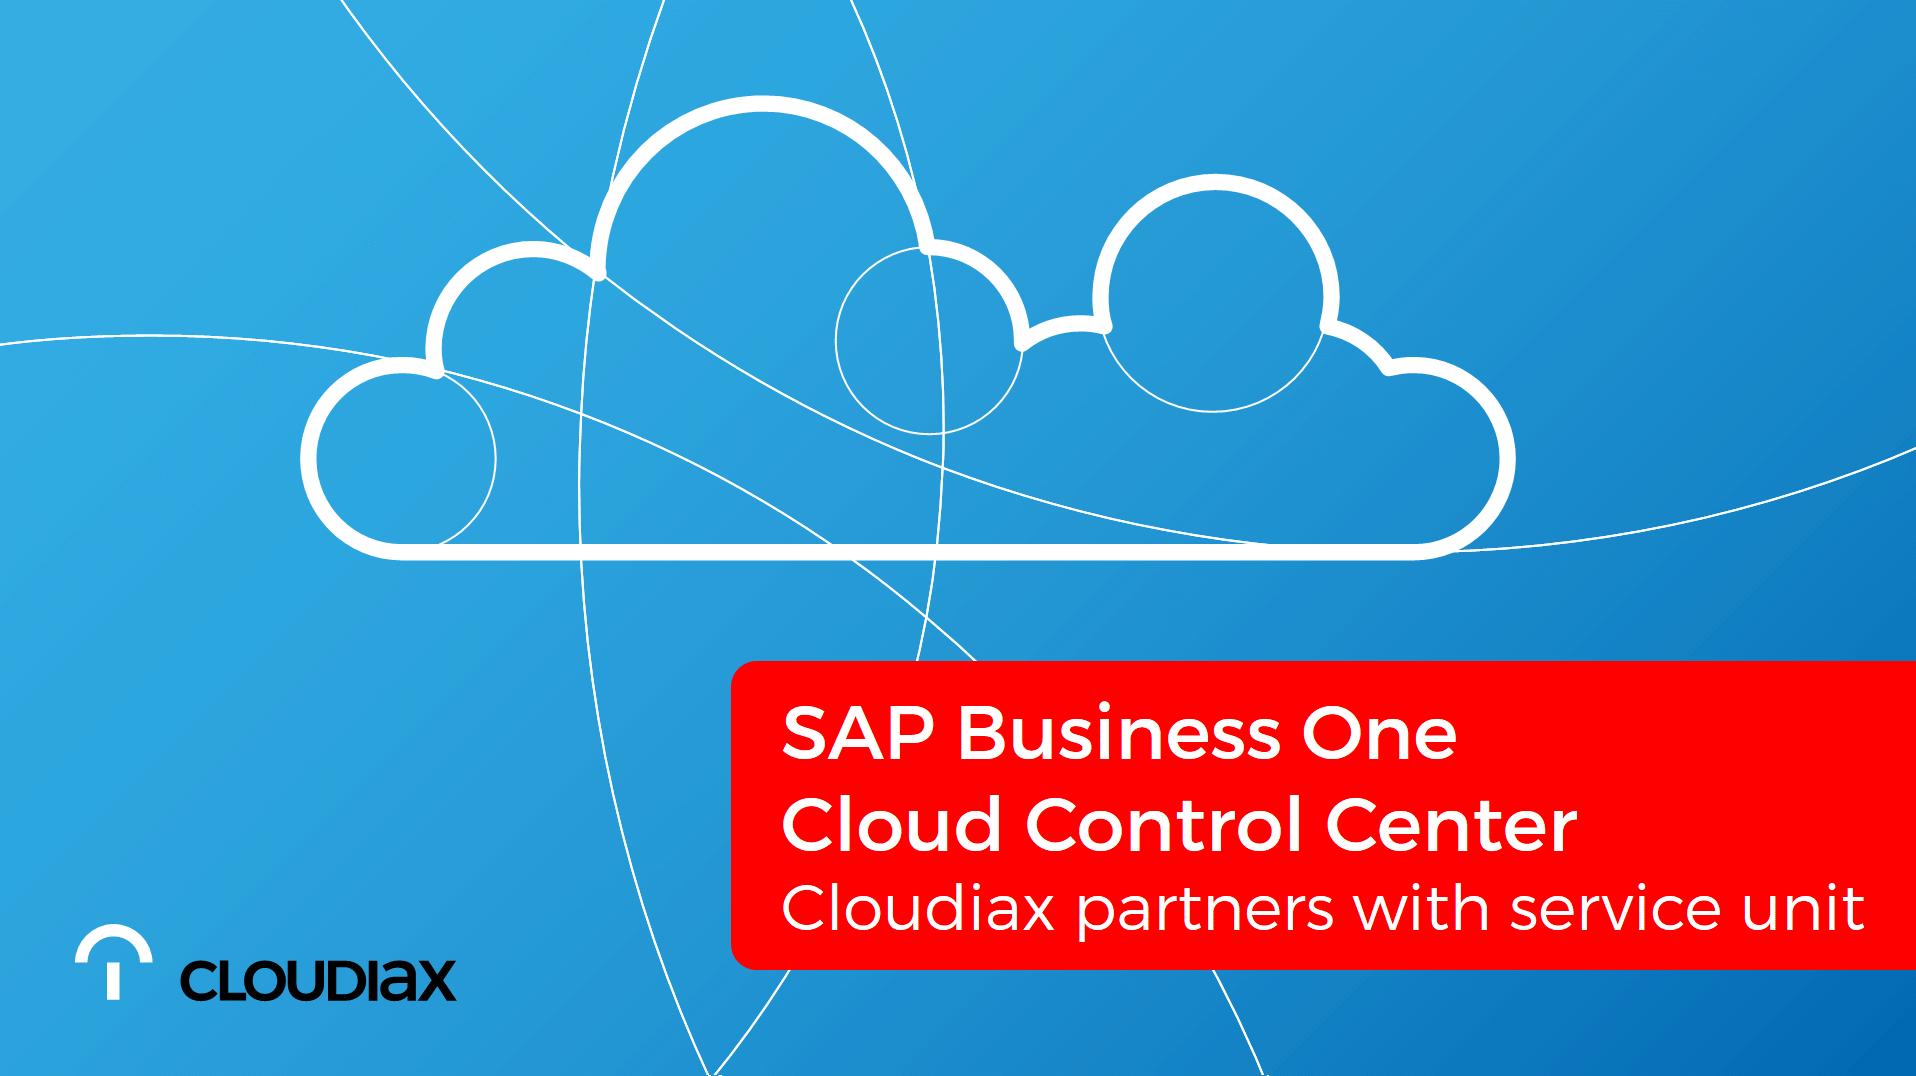 SAP Cloud Control Center - Cloudiax partners with service unit